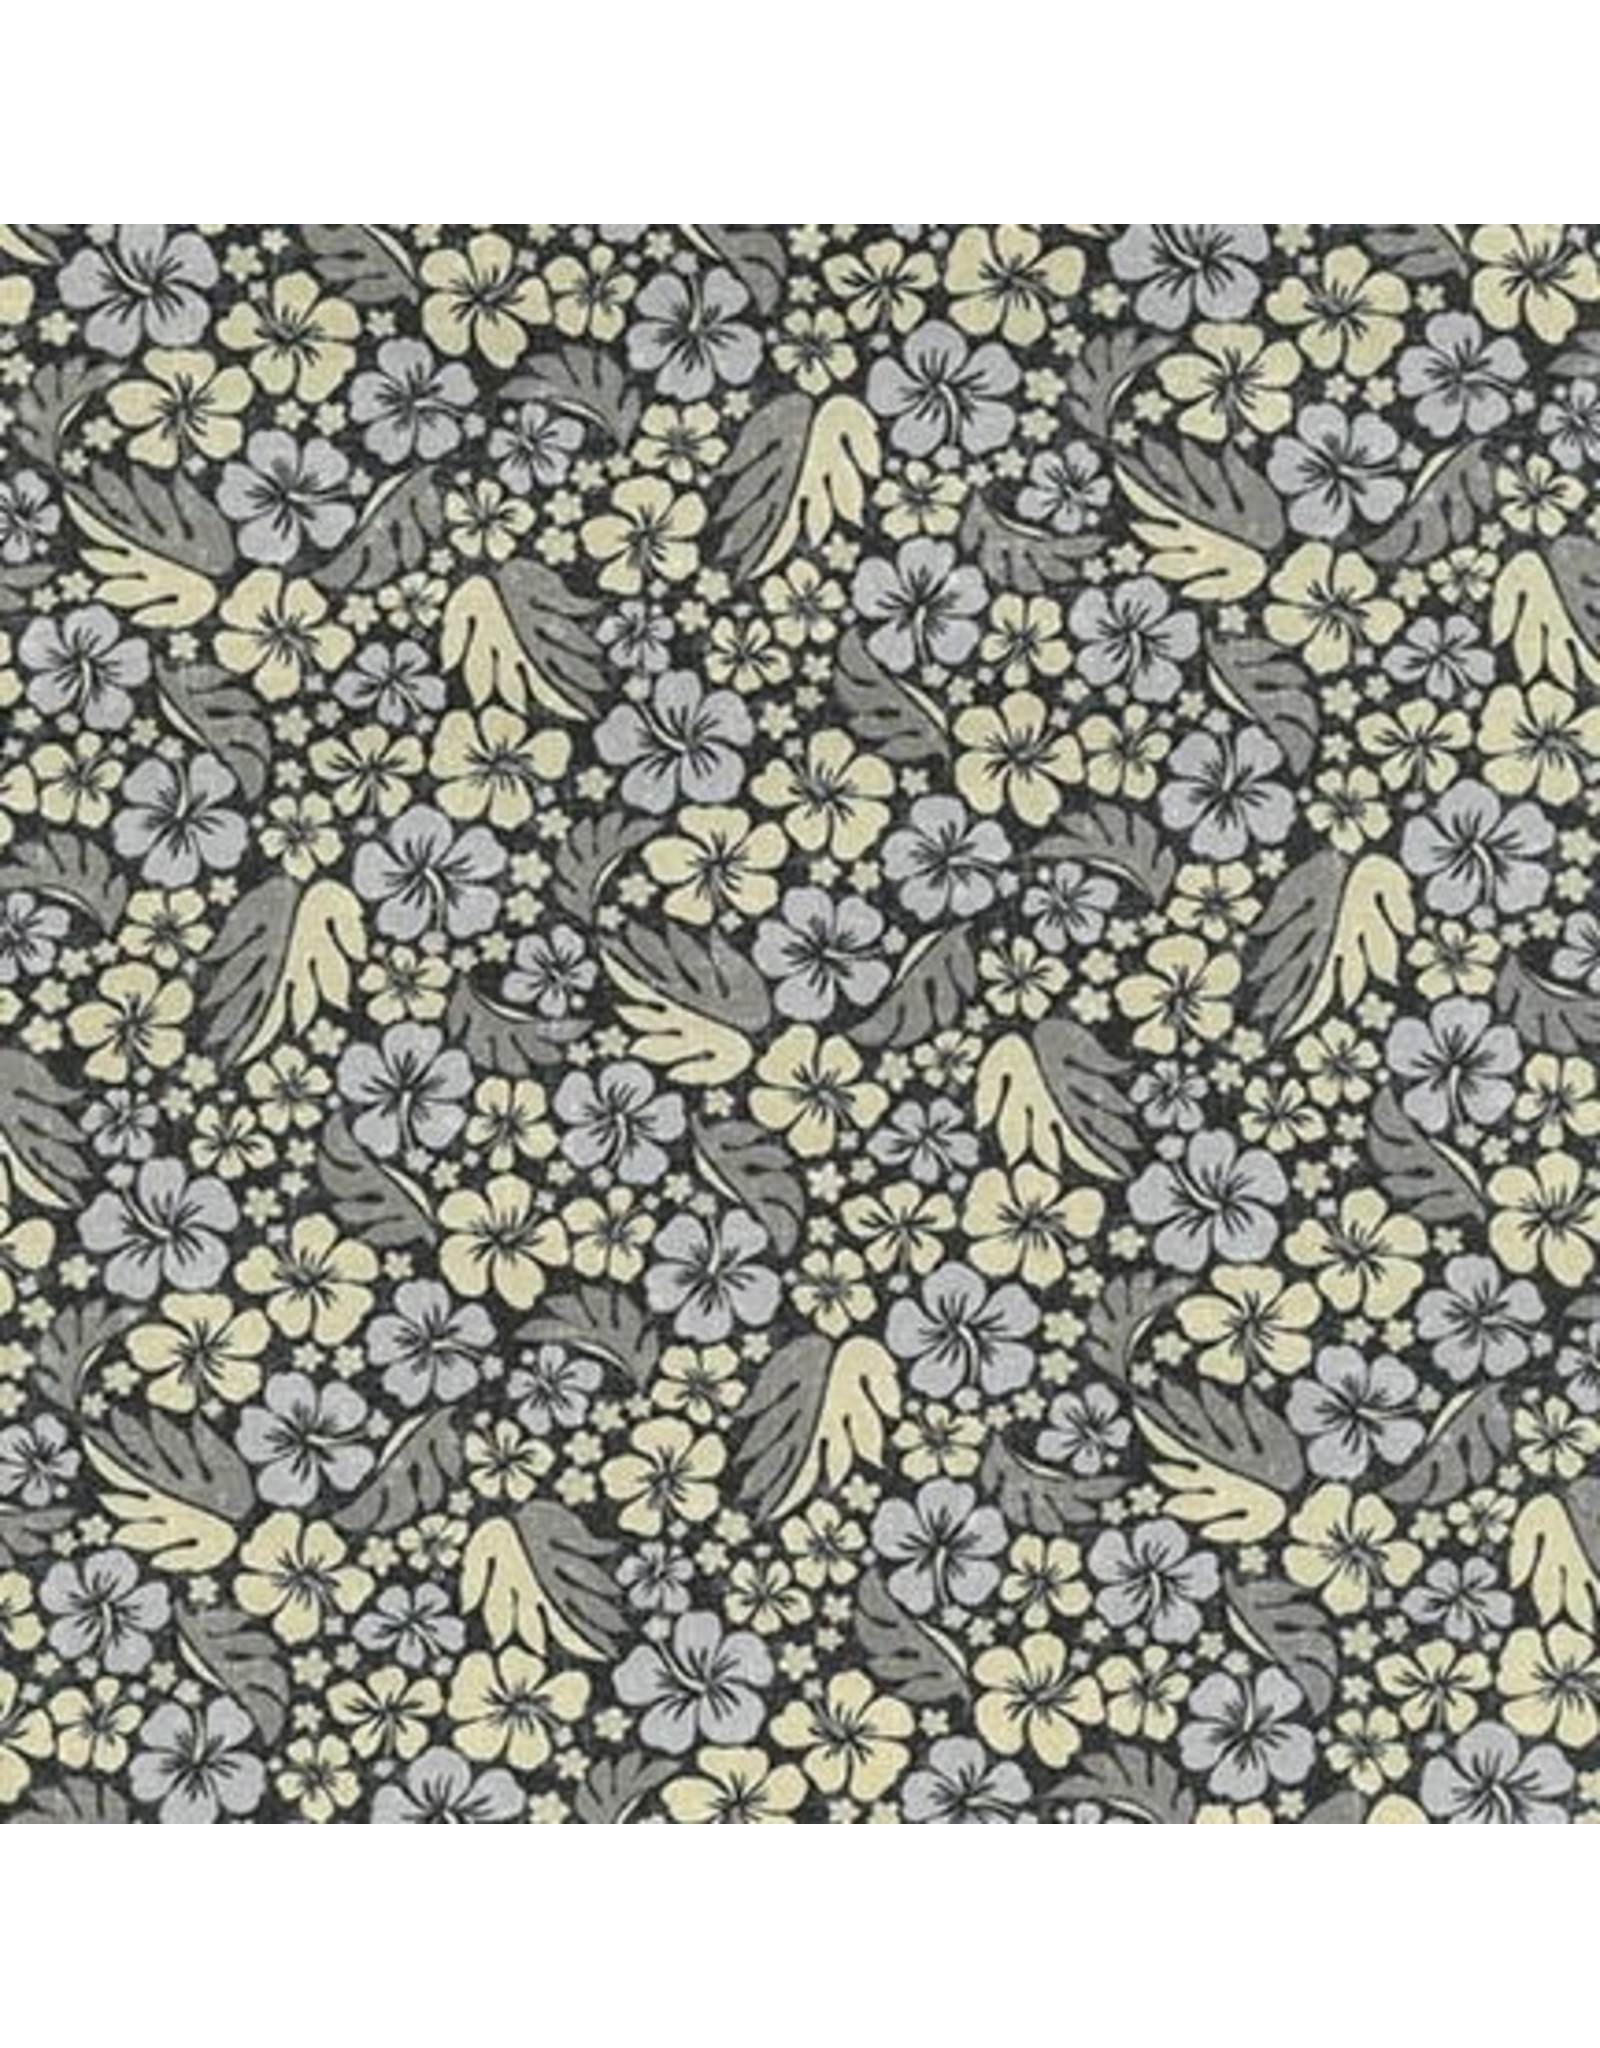 Sevenberry sland Paradise, Hibiscus in Black, Fabric Half-Yards